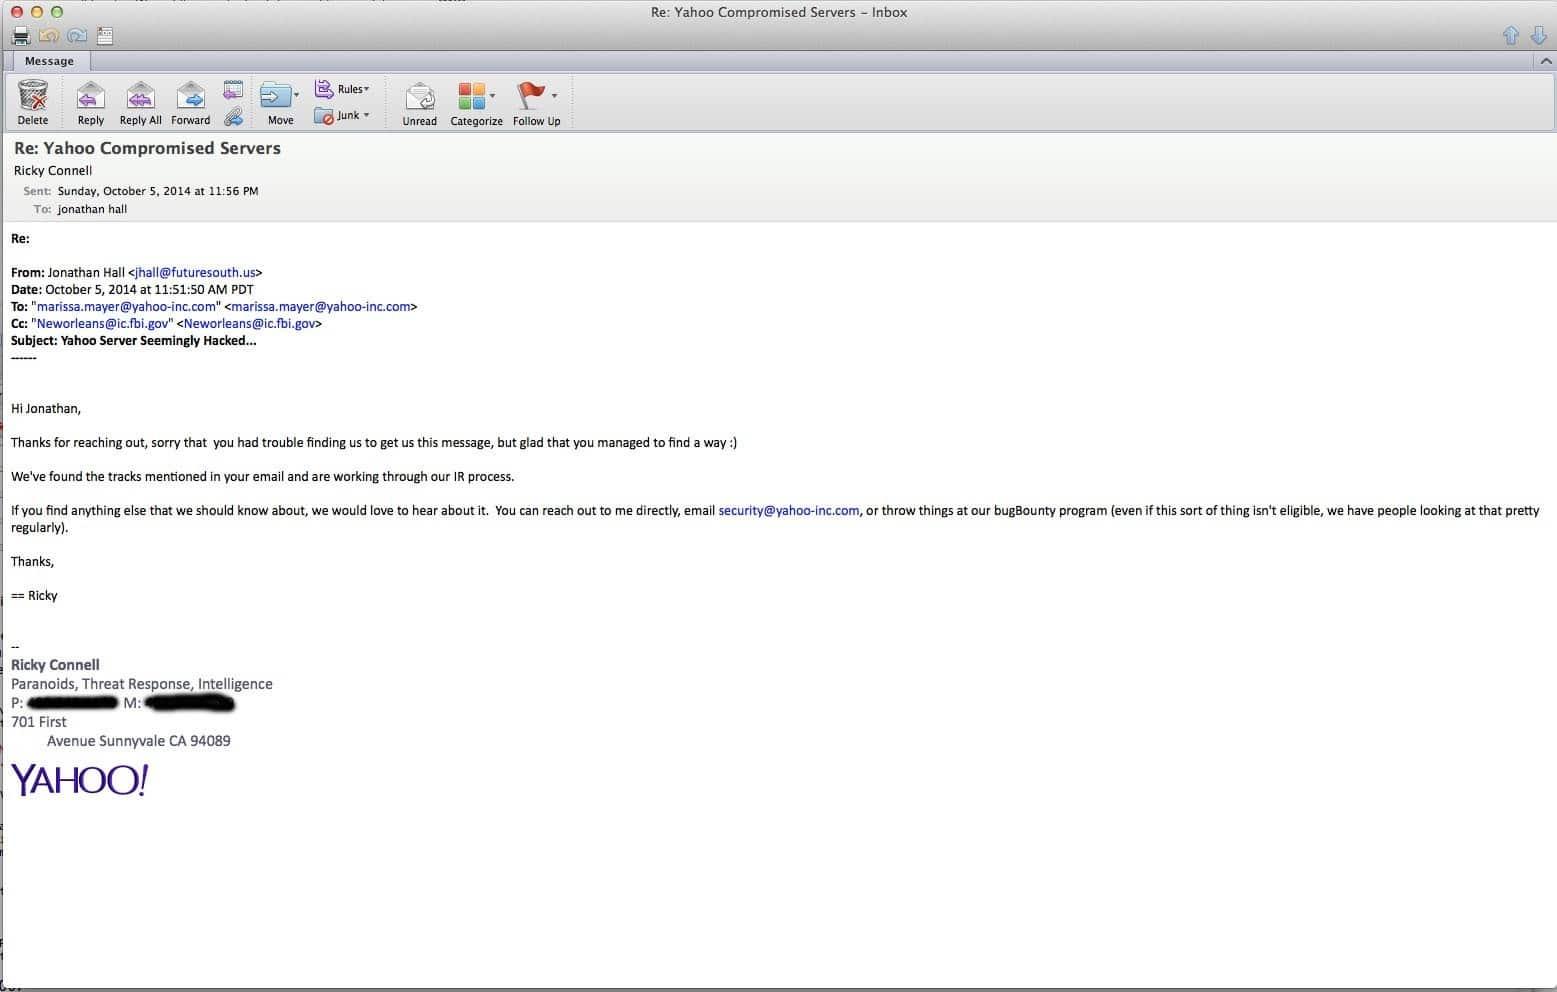 Yahoo-WinZip-Servers-Compromised-Through-Shellshock-Vulnerability-461164-2